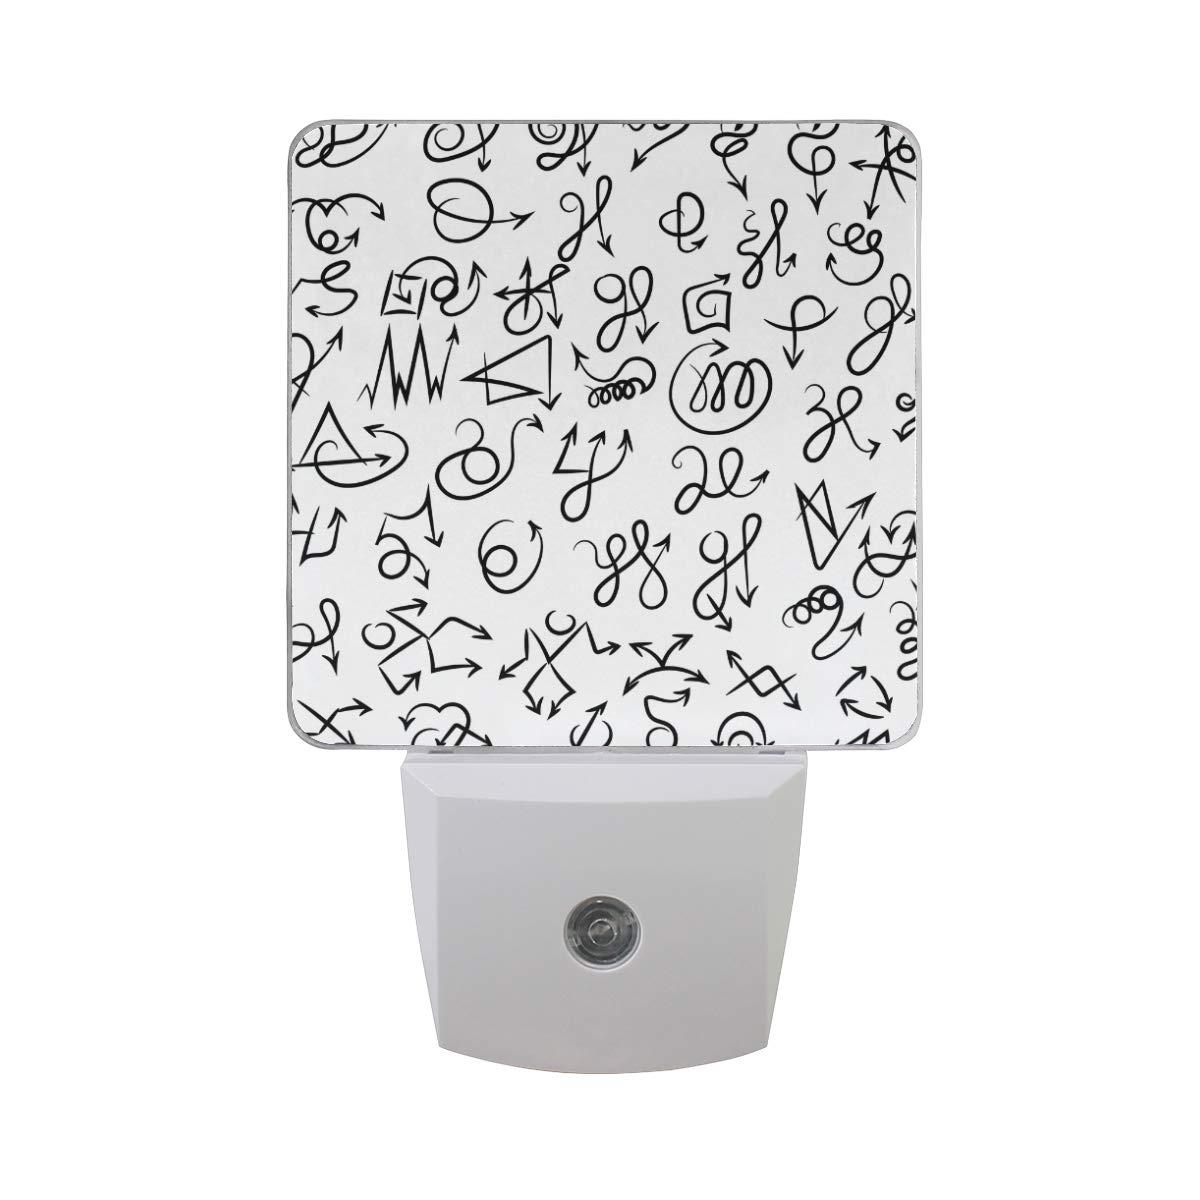 Night Light Arrow Doodles Vector Customized Plug-in LED Warm White Nightlight for Bedroom Bathroom Hallway Stairways Decorative 2 Pack